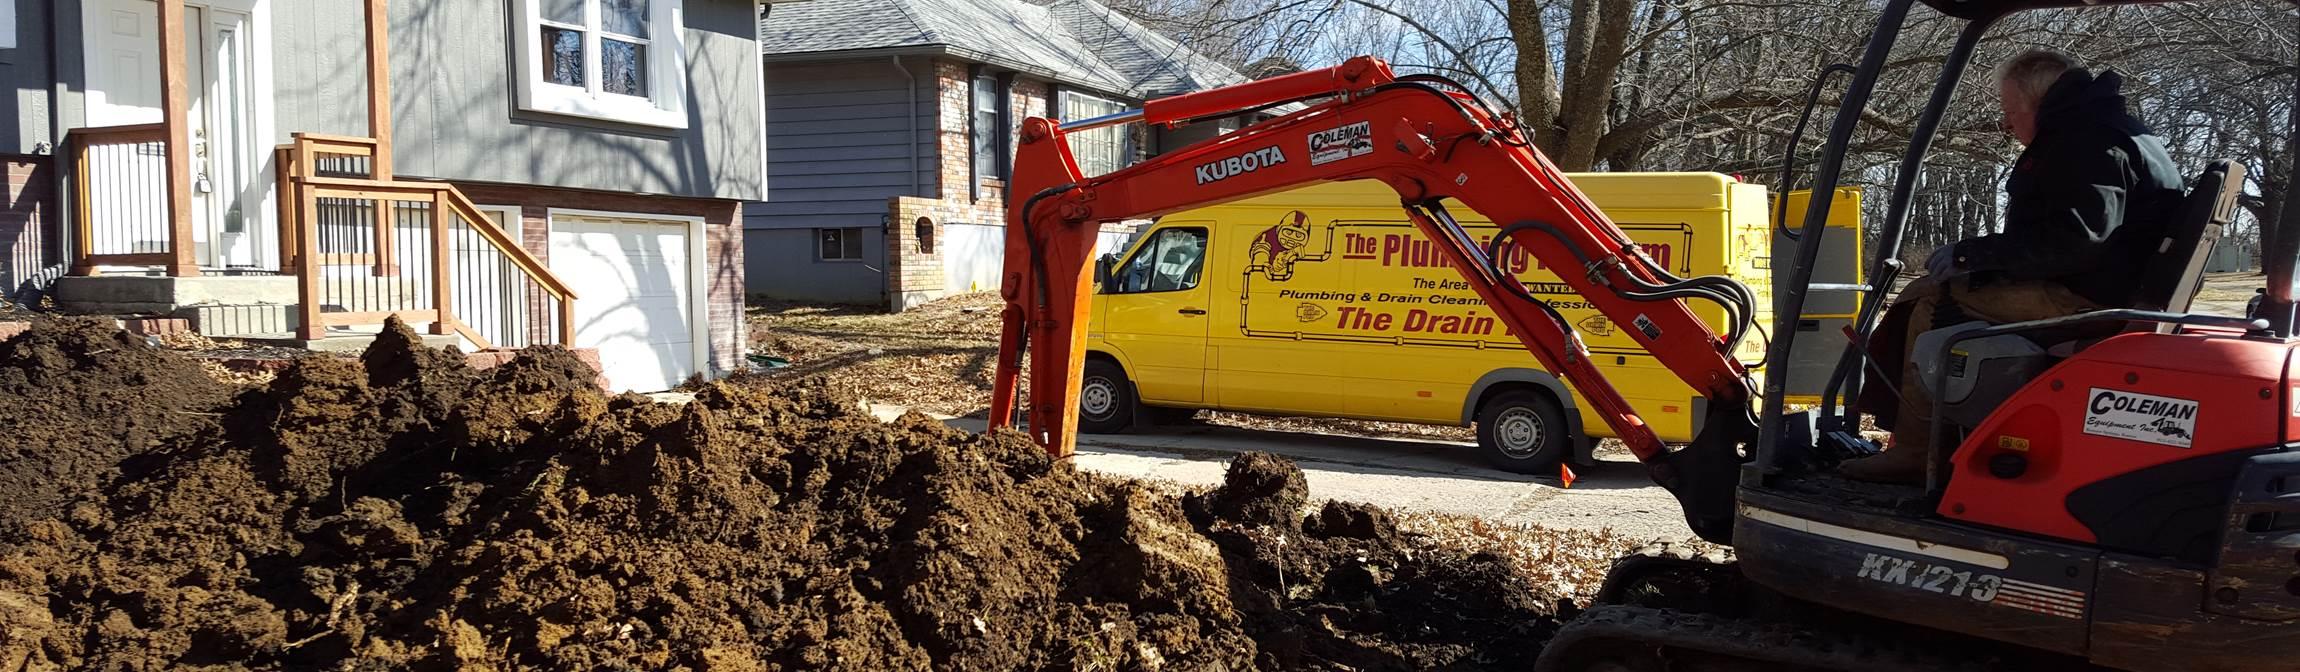 Underground sewer repair job by The Plumbing Pro van